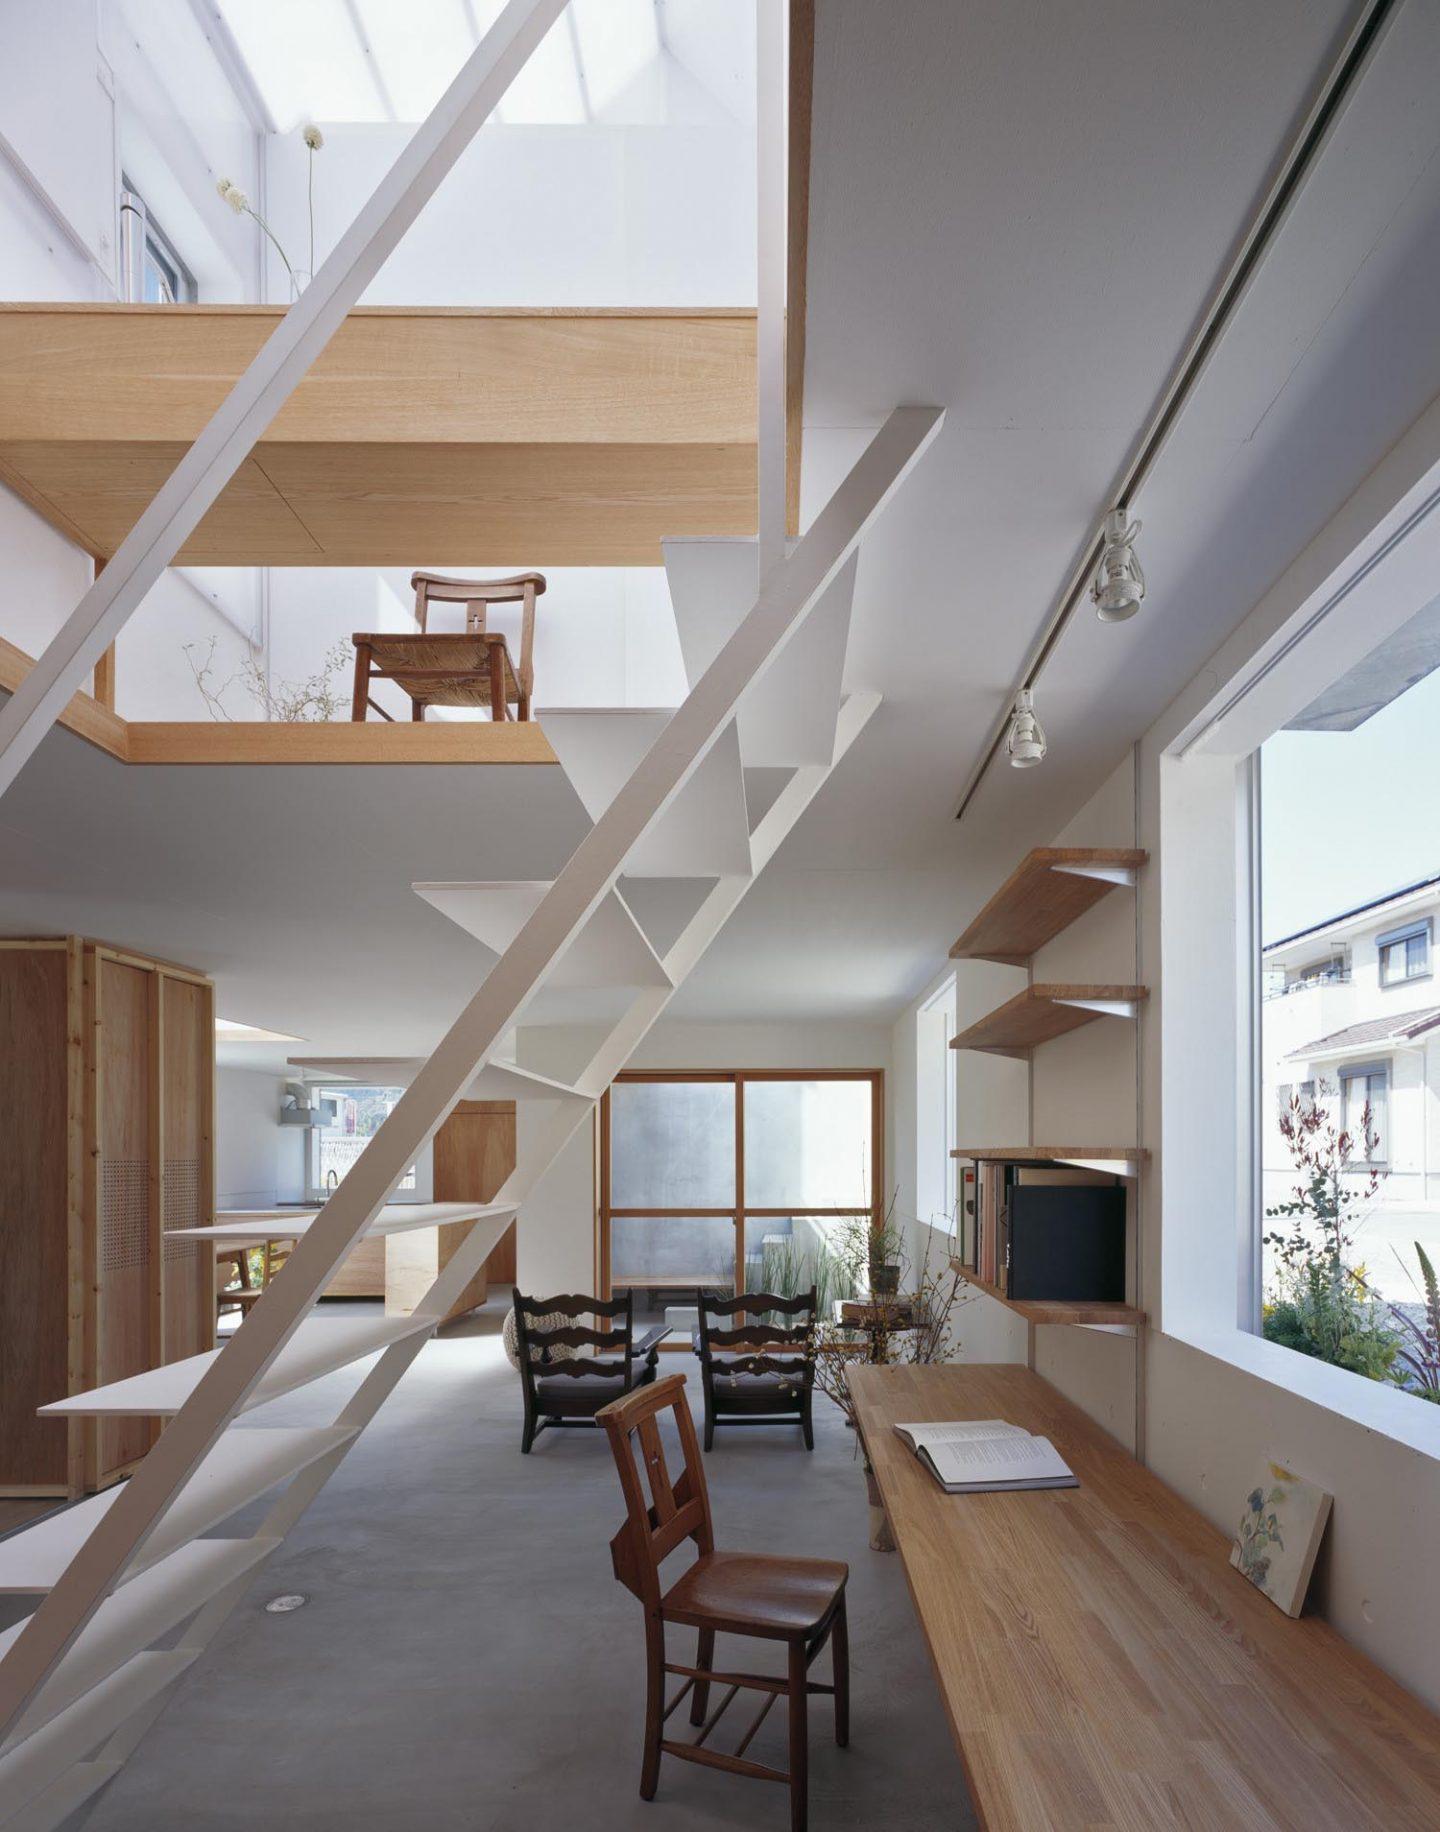 iGNANT_Architecture_Tato_Architects_Yo_Shimada_House_In_Yamasaki_21